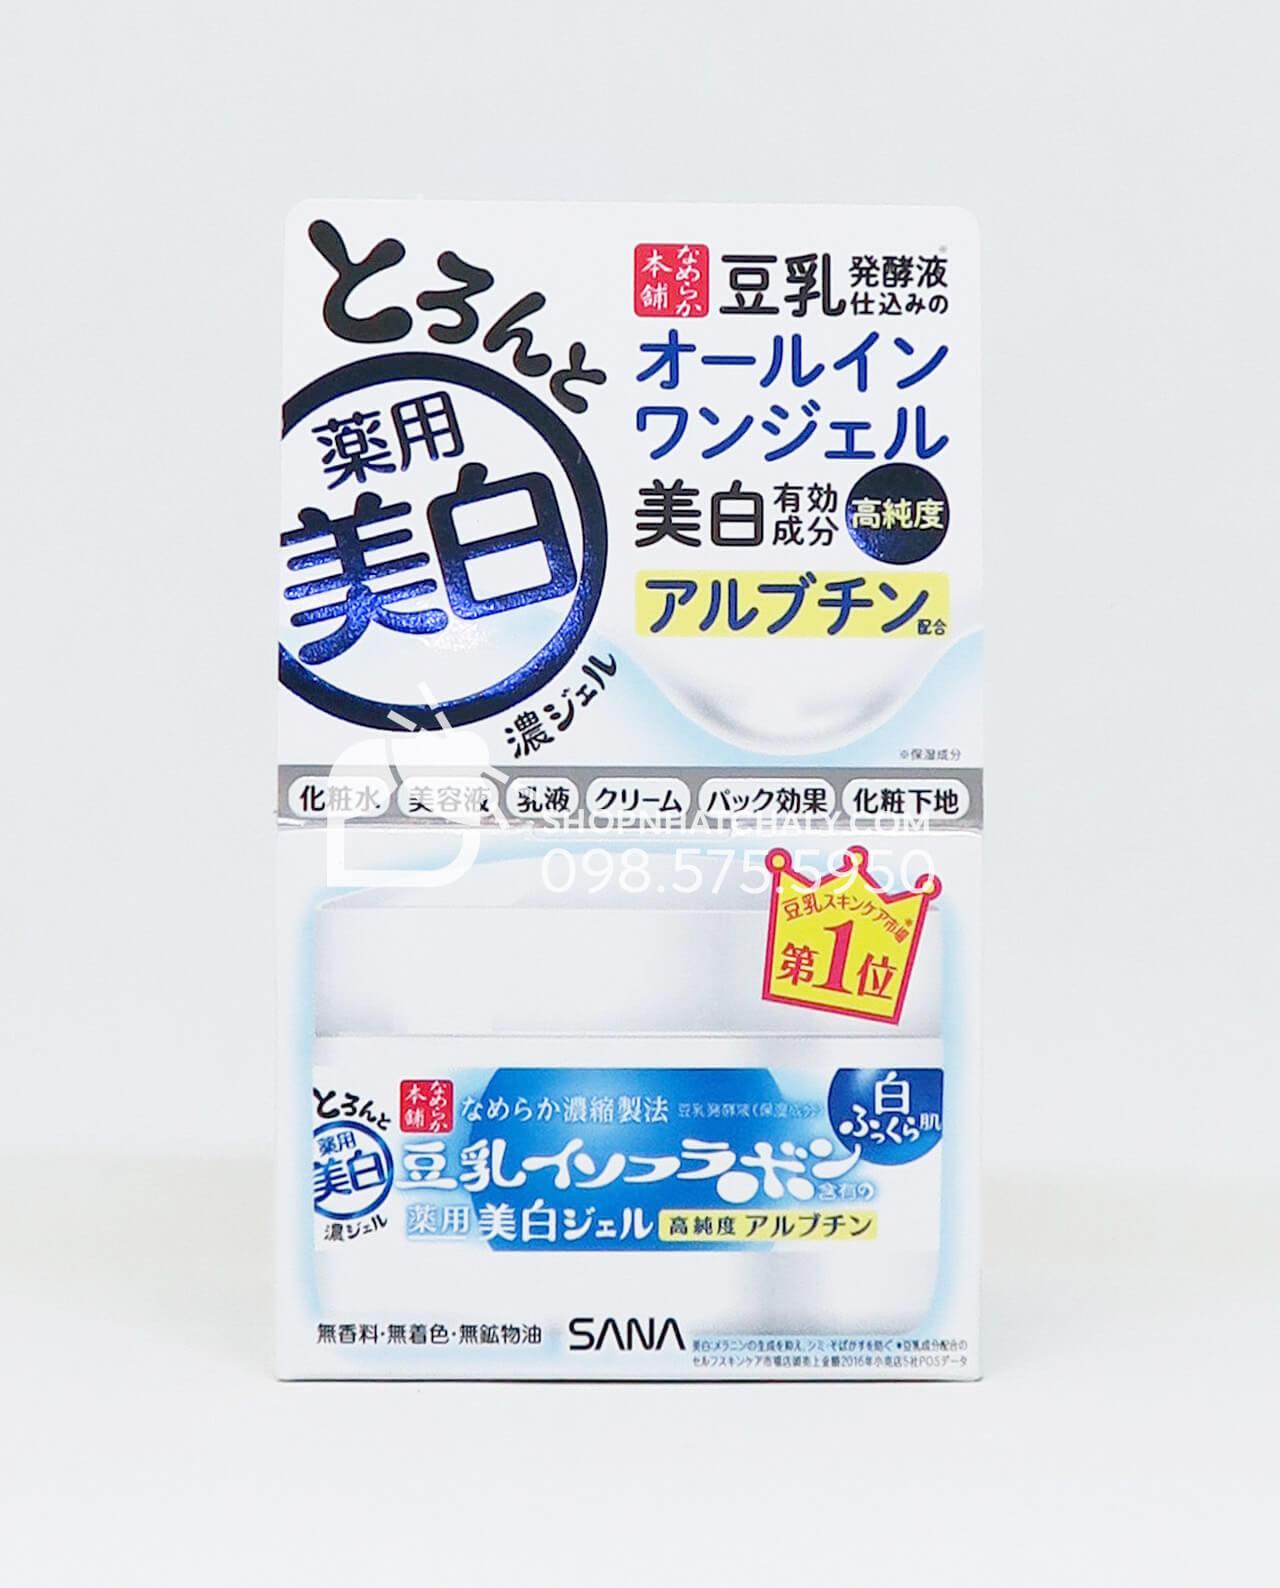 Gel dưỡng trắng trị nám 6 trong 1 Sana Whitening Isoflavone Gel